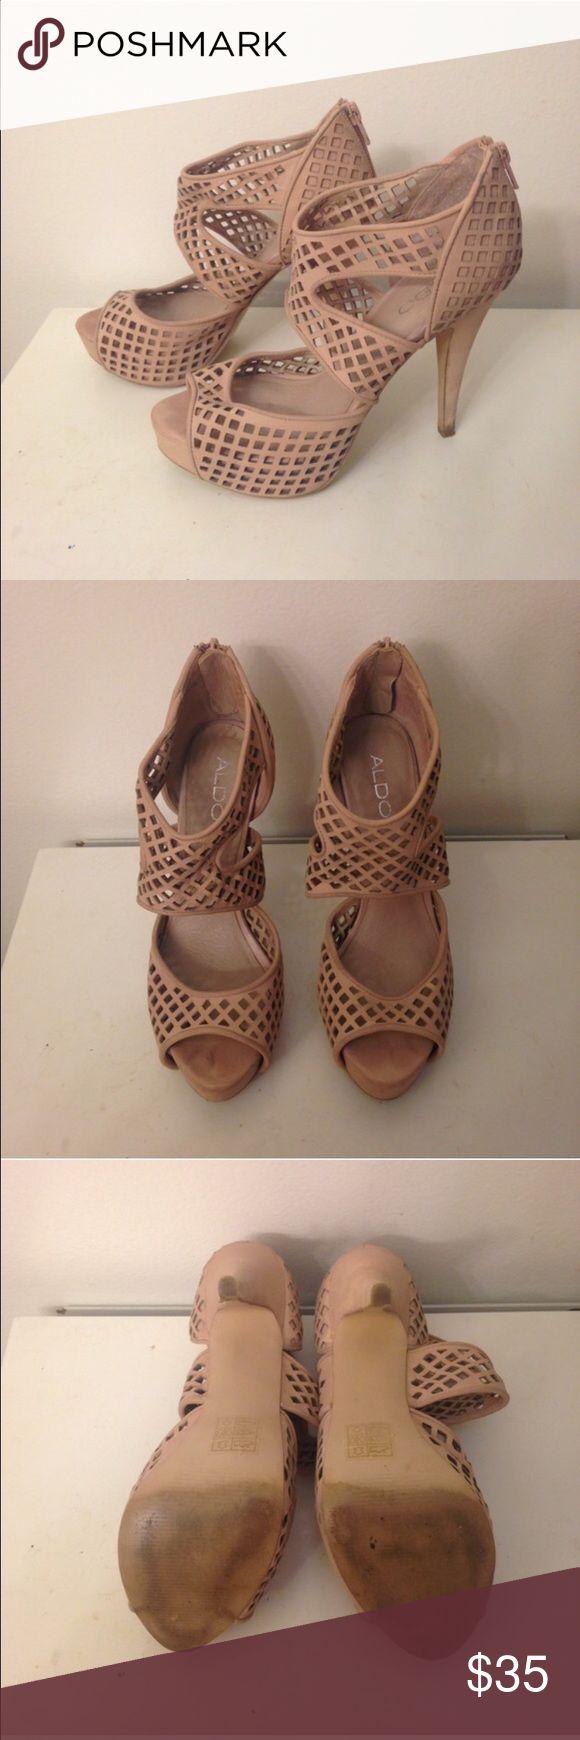 Aldo blush colored heels in sz 8 - worn Aldo blush colored heels in sz 8 - worn Aldo Shoes Heels